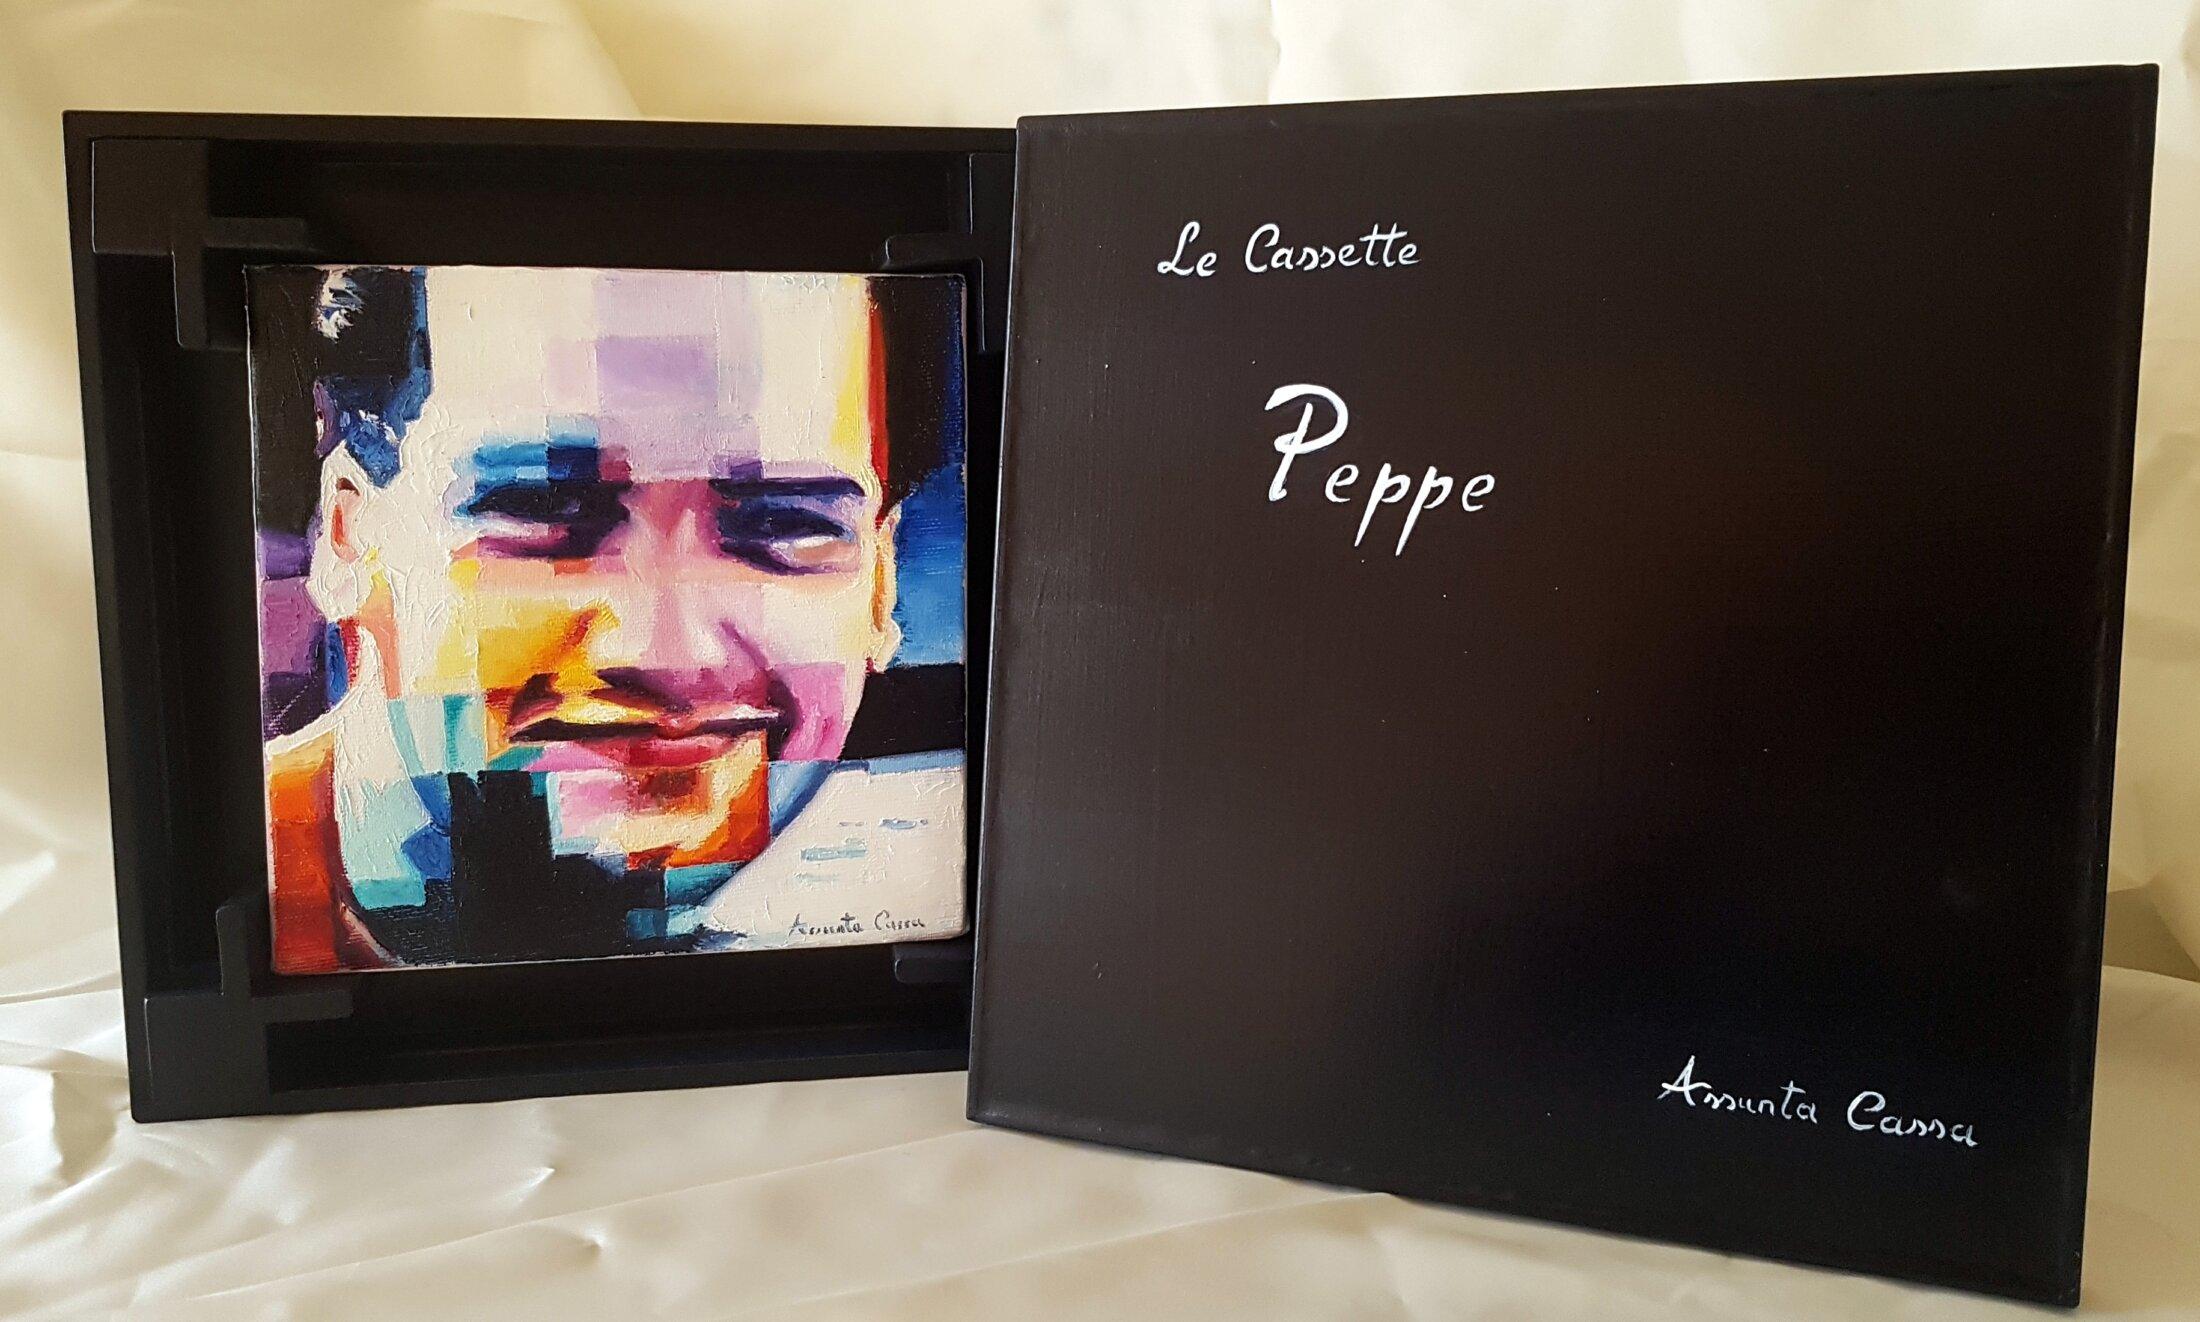 Le Cassette. Peppe